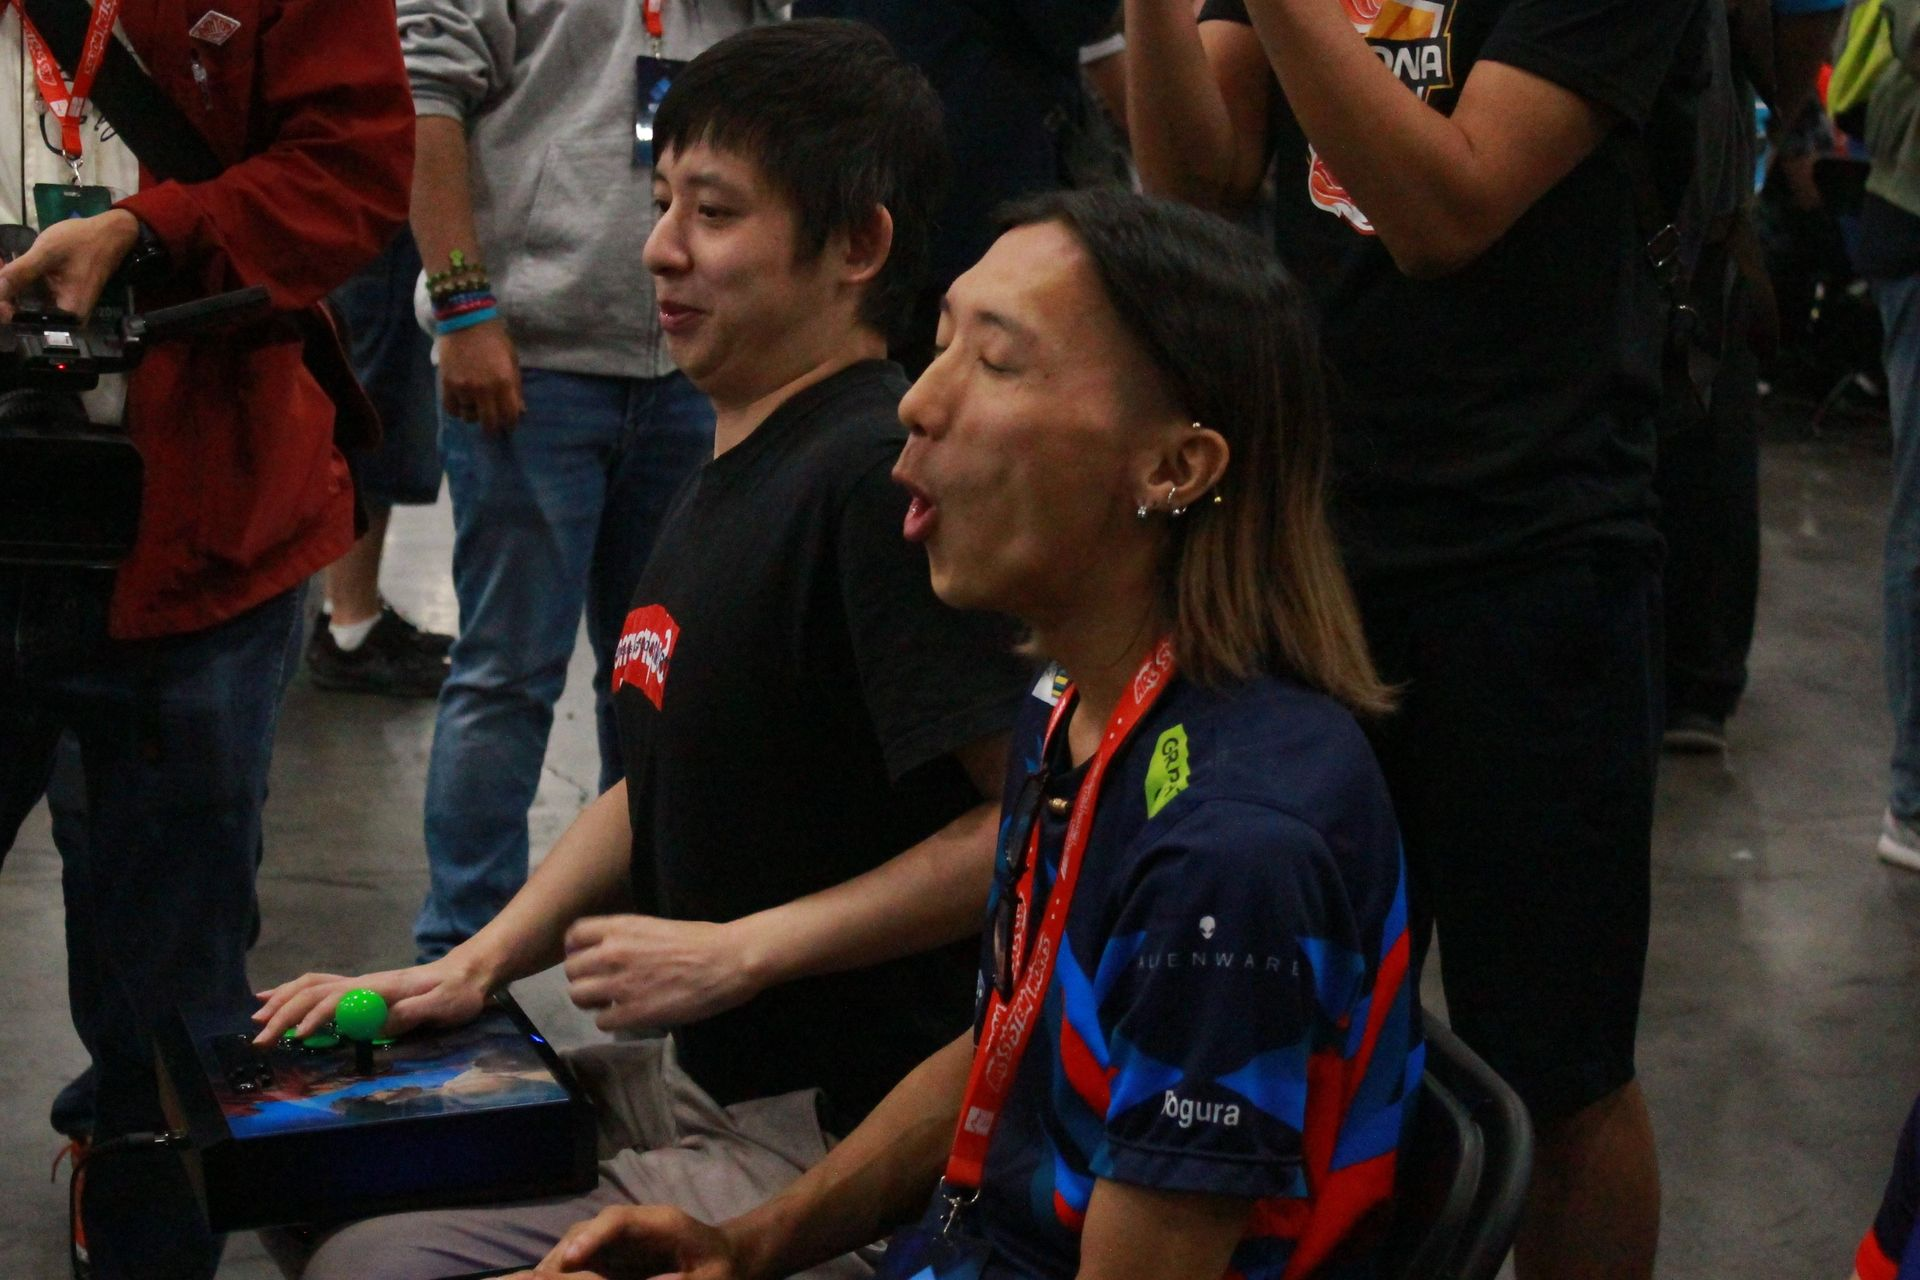 HumanBomb選手(写真左)とどぐら選手(写真右)